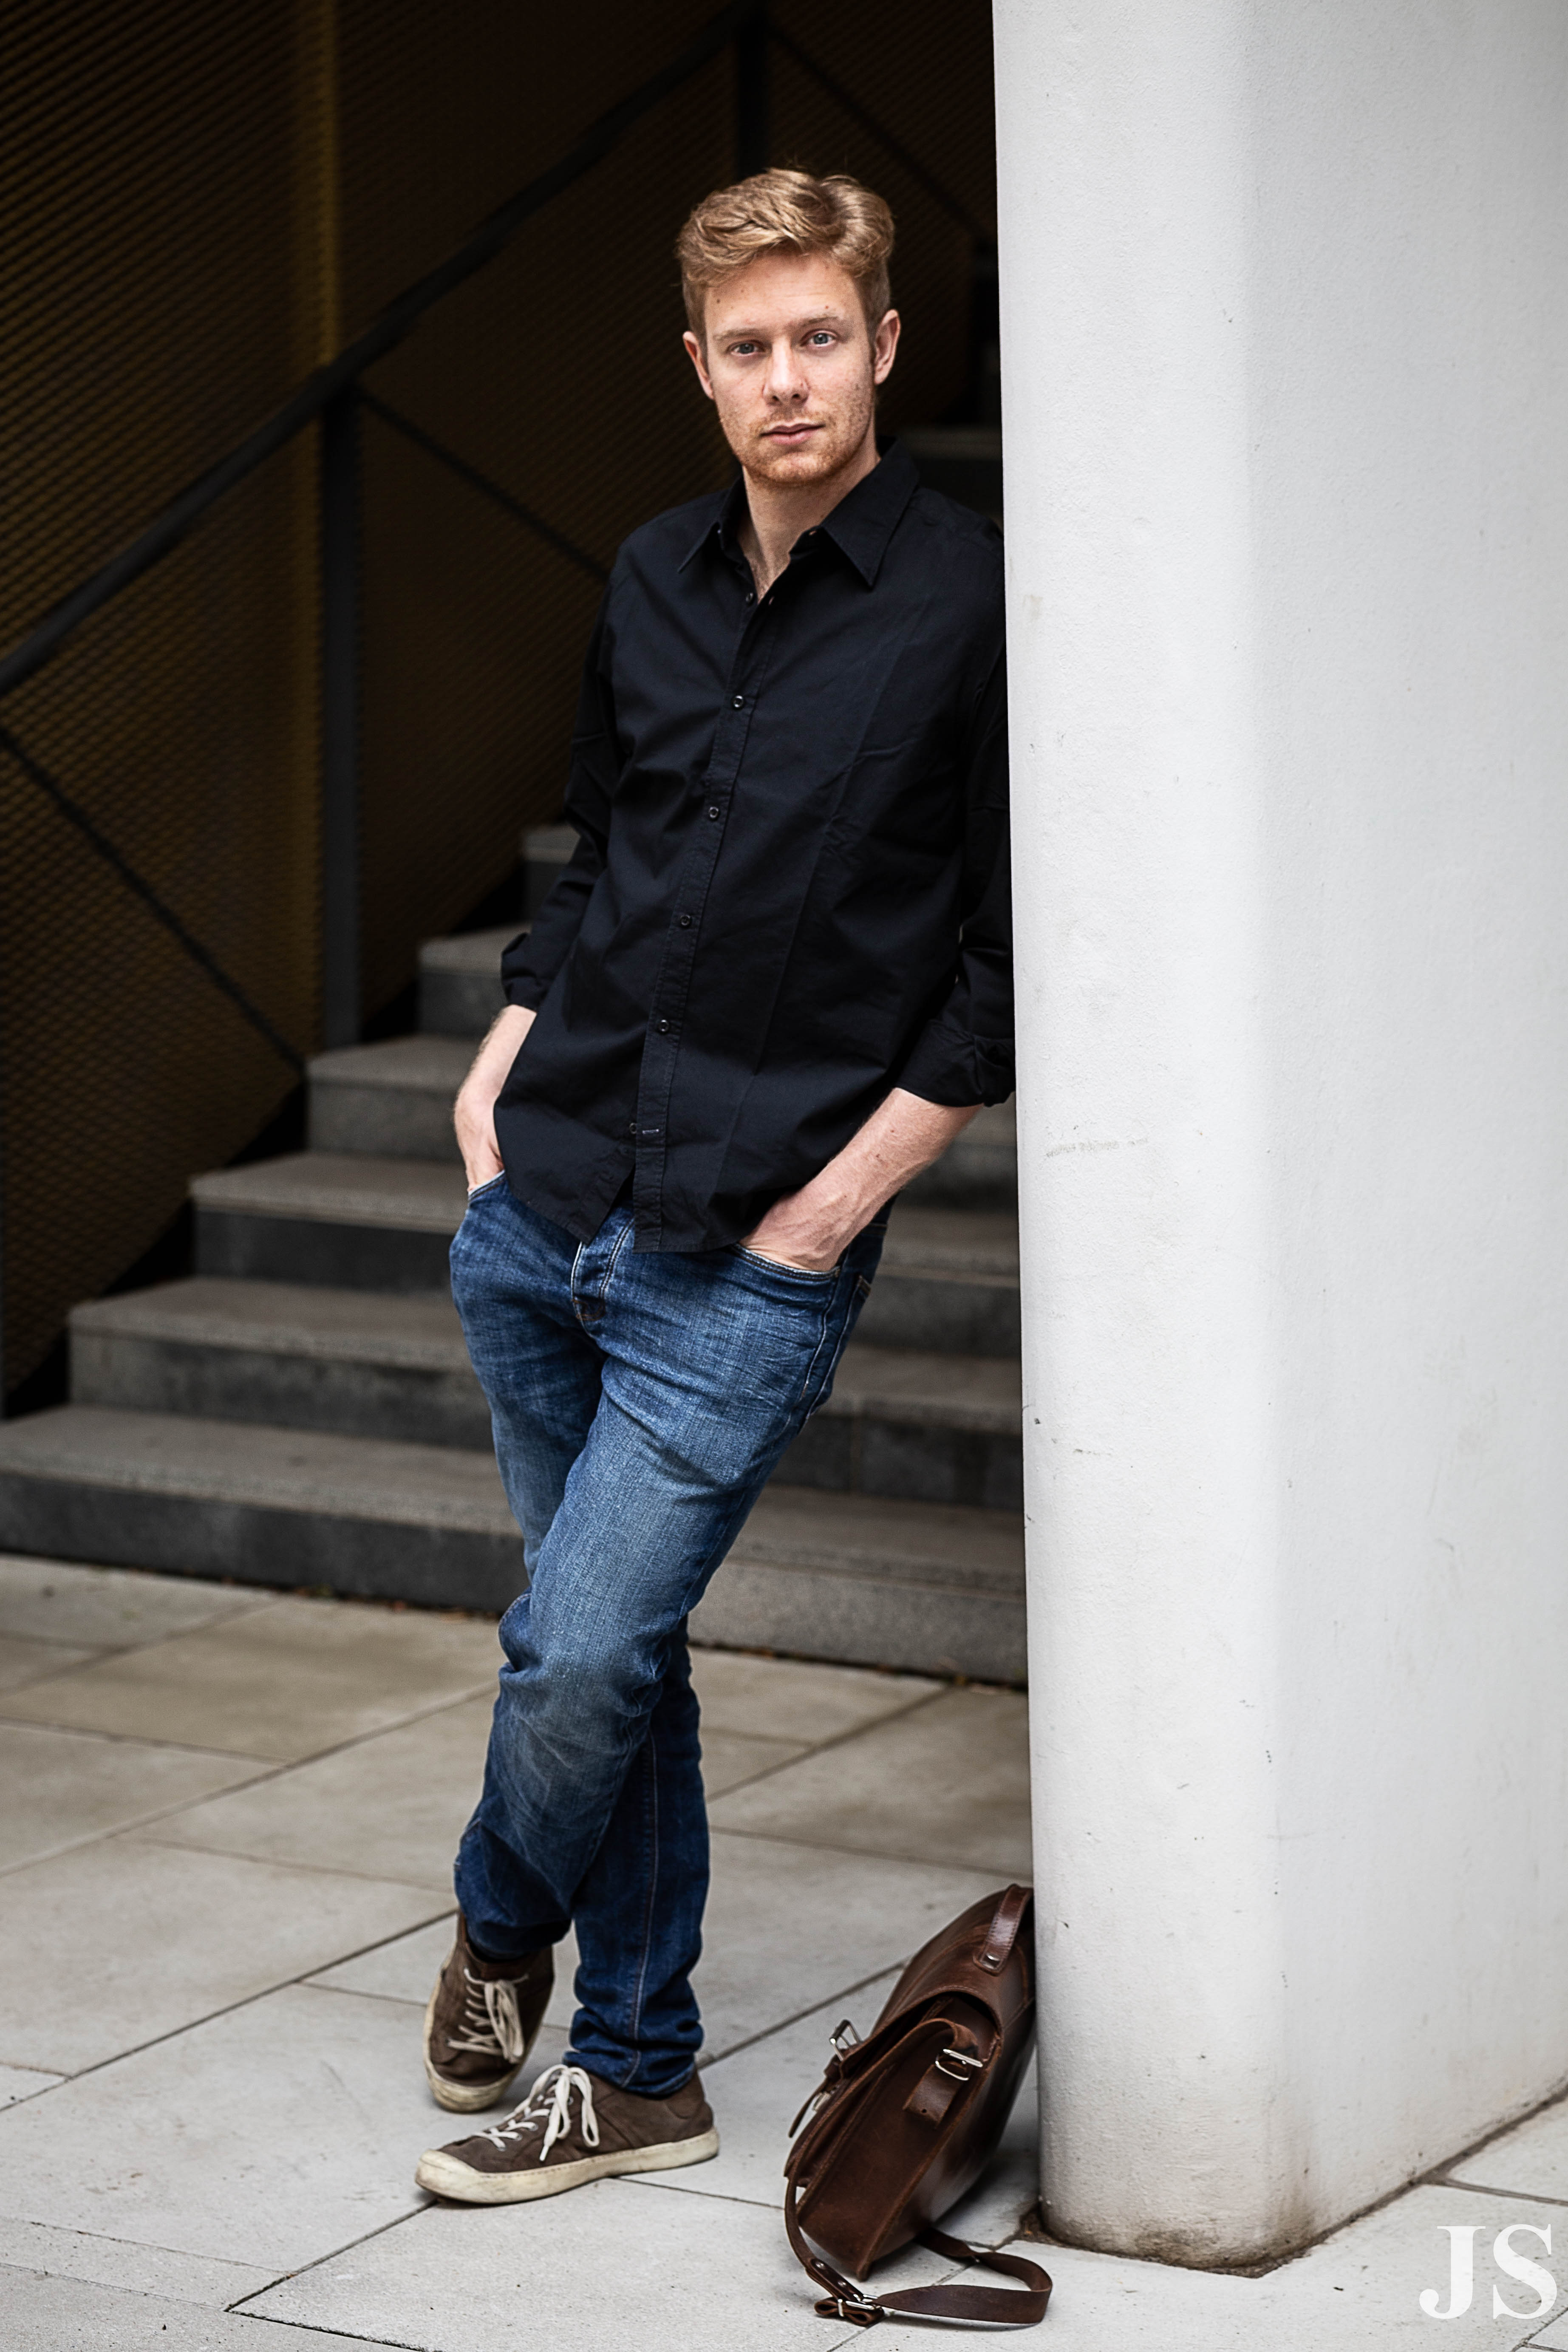 Chris Max Nachtigall